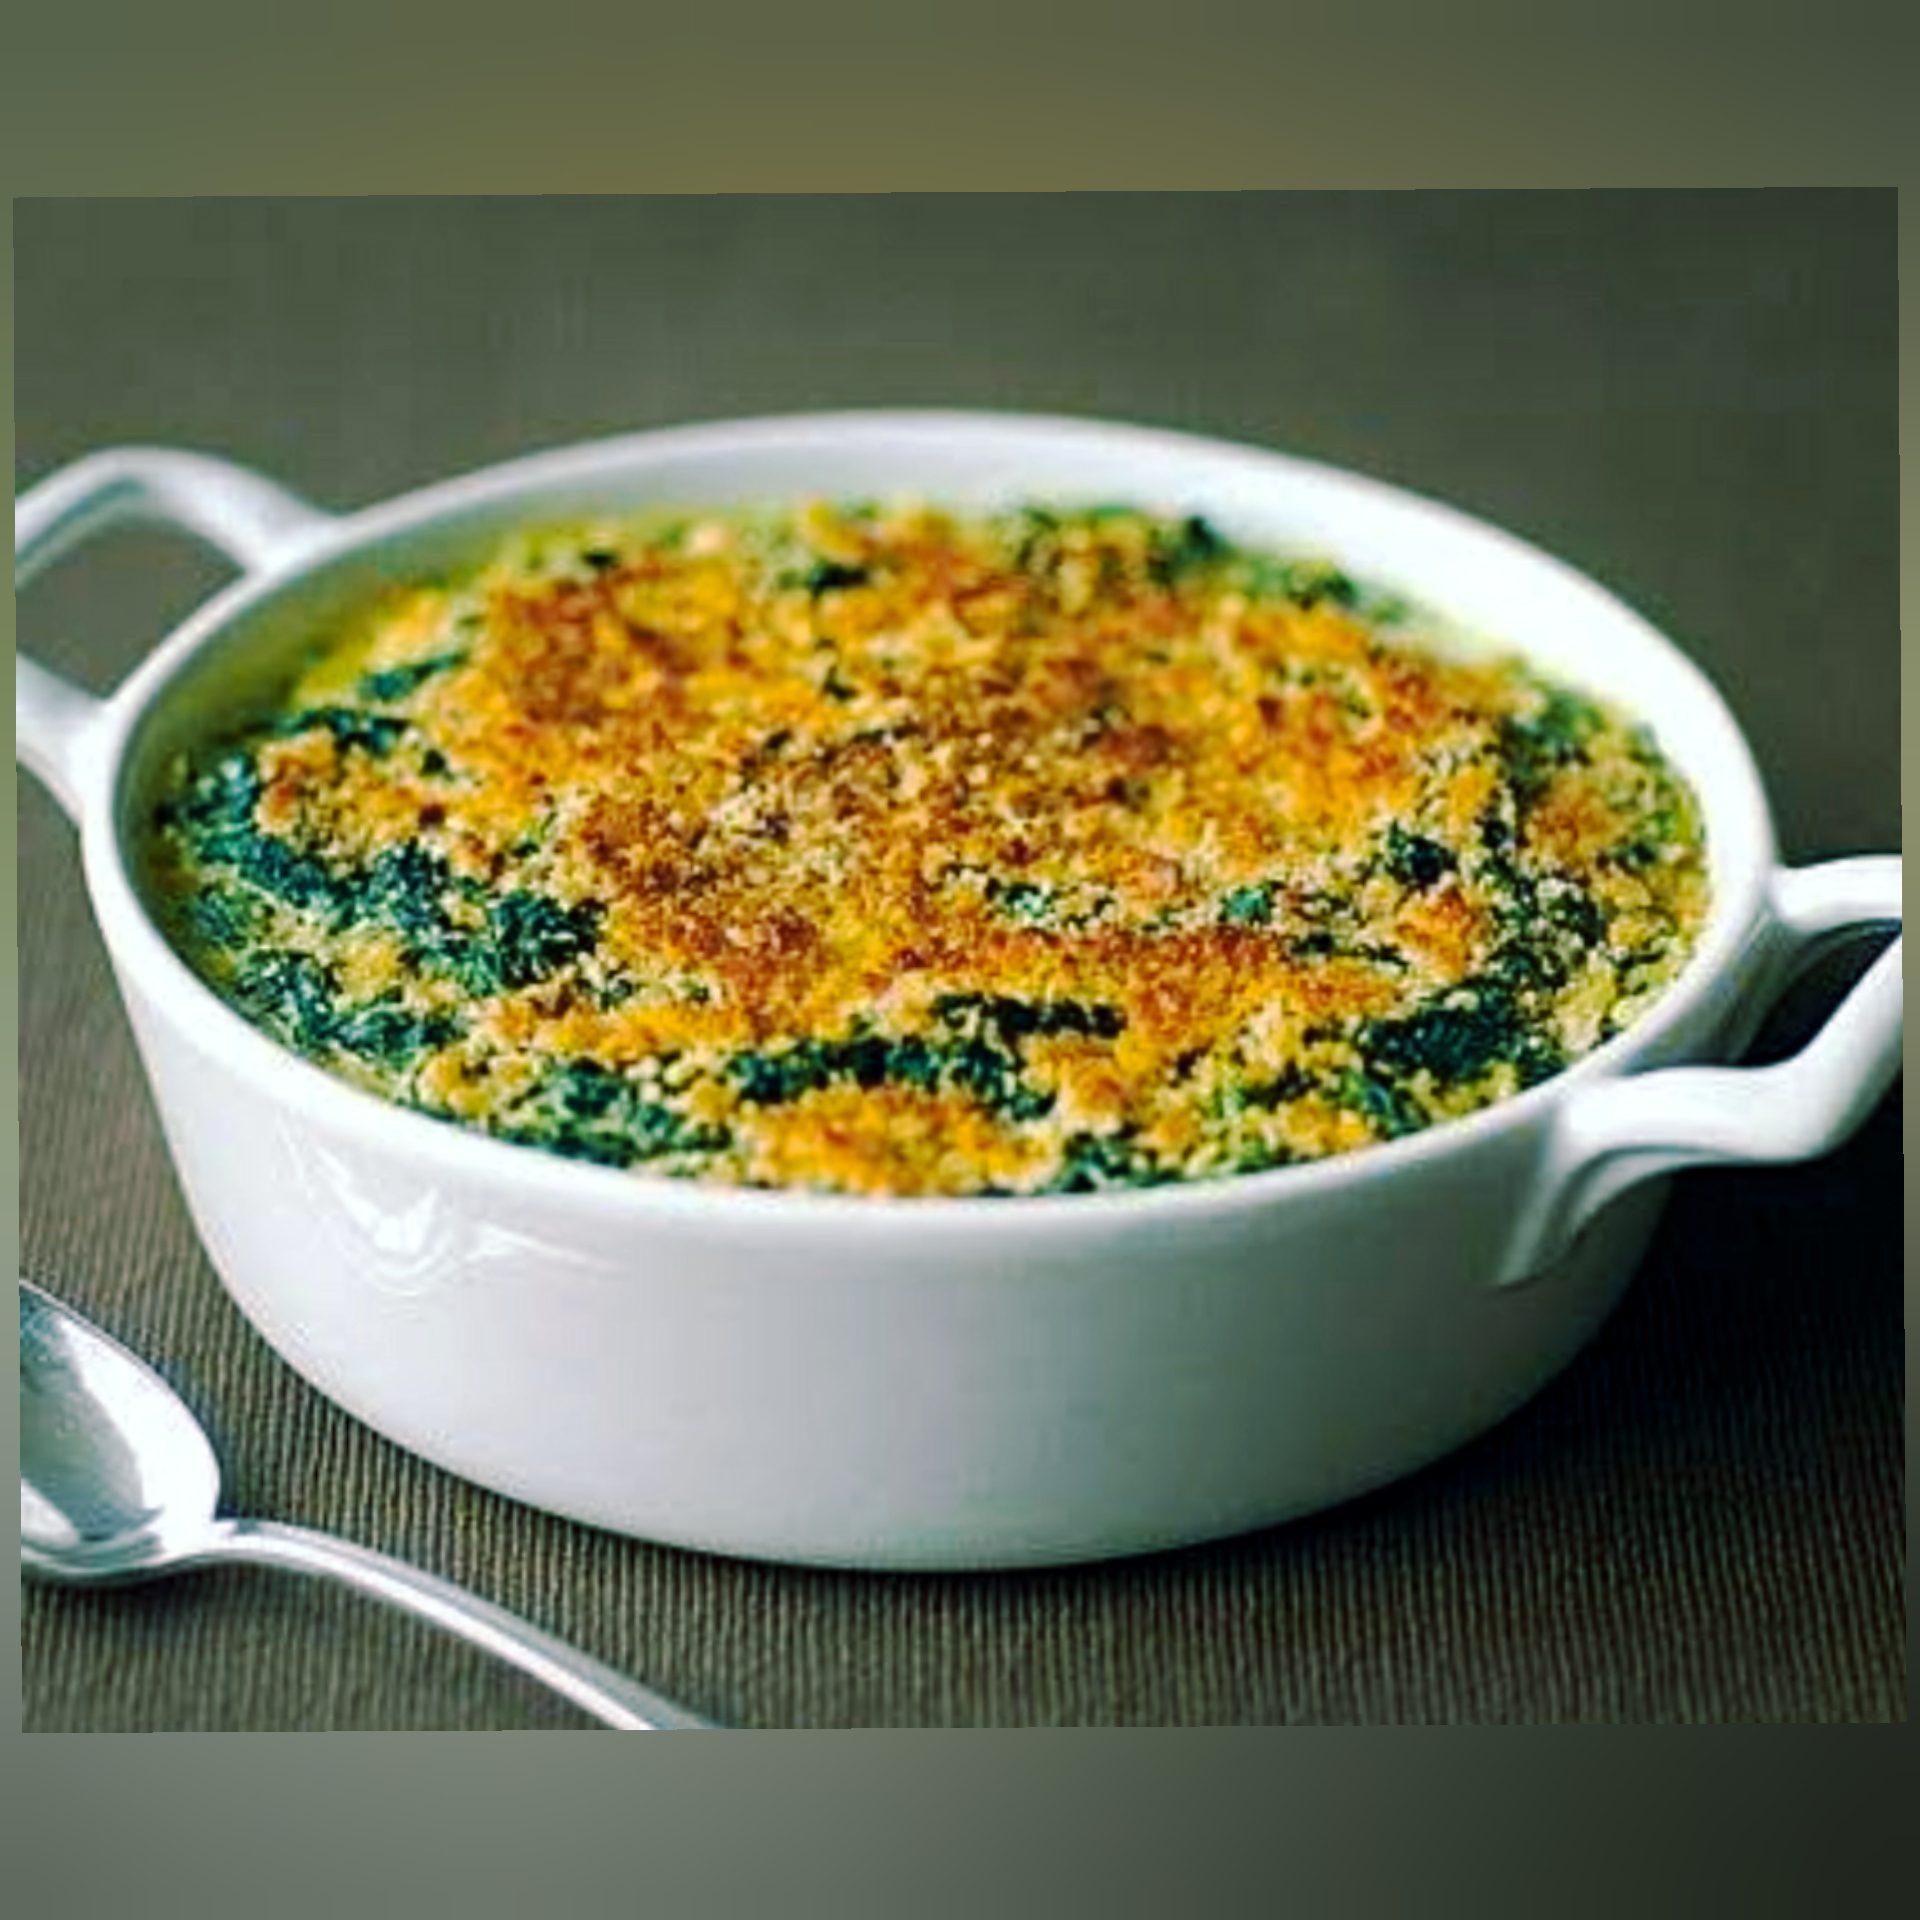 vegetable Au gratin